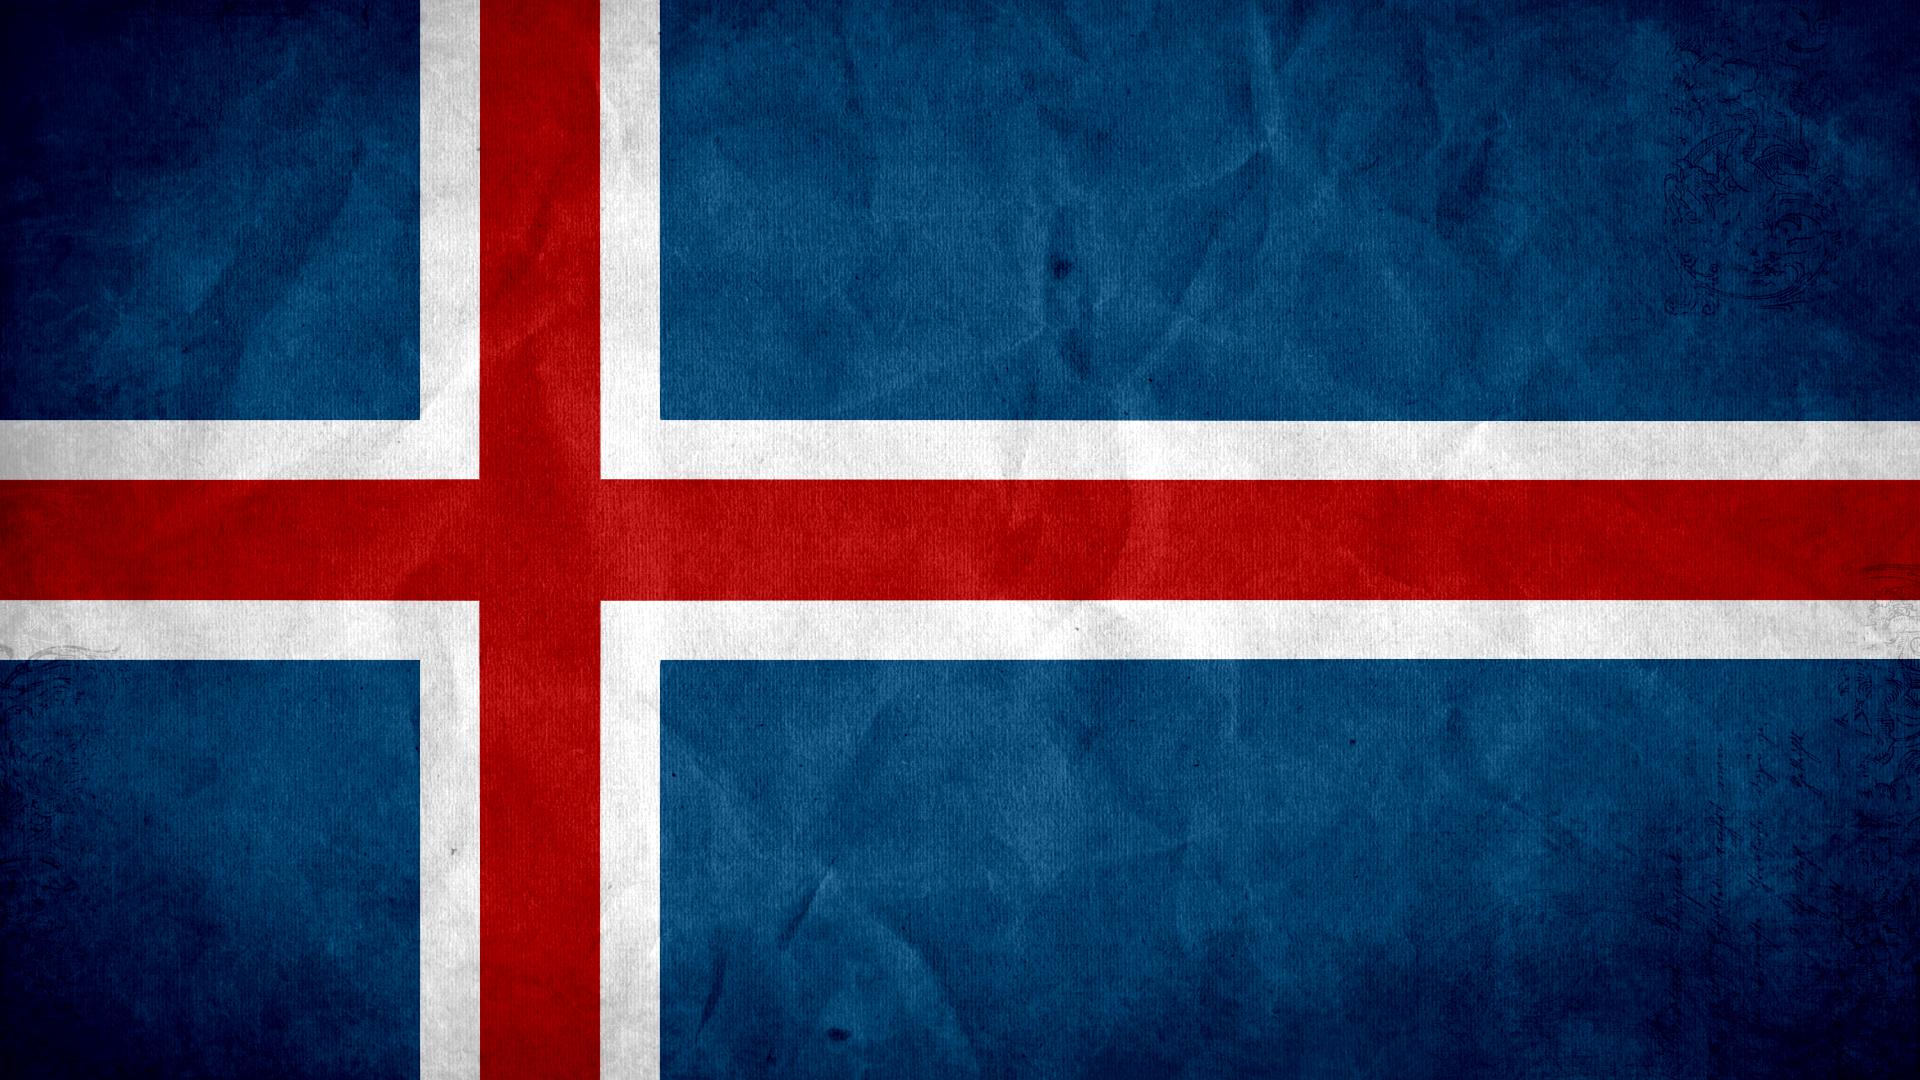 Iceland Flag HD Wallpaper, Background Images